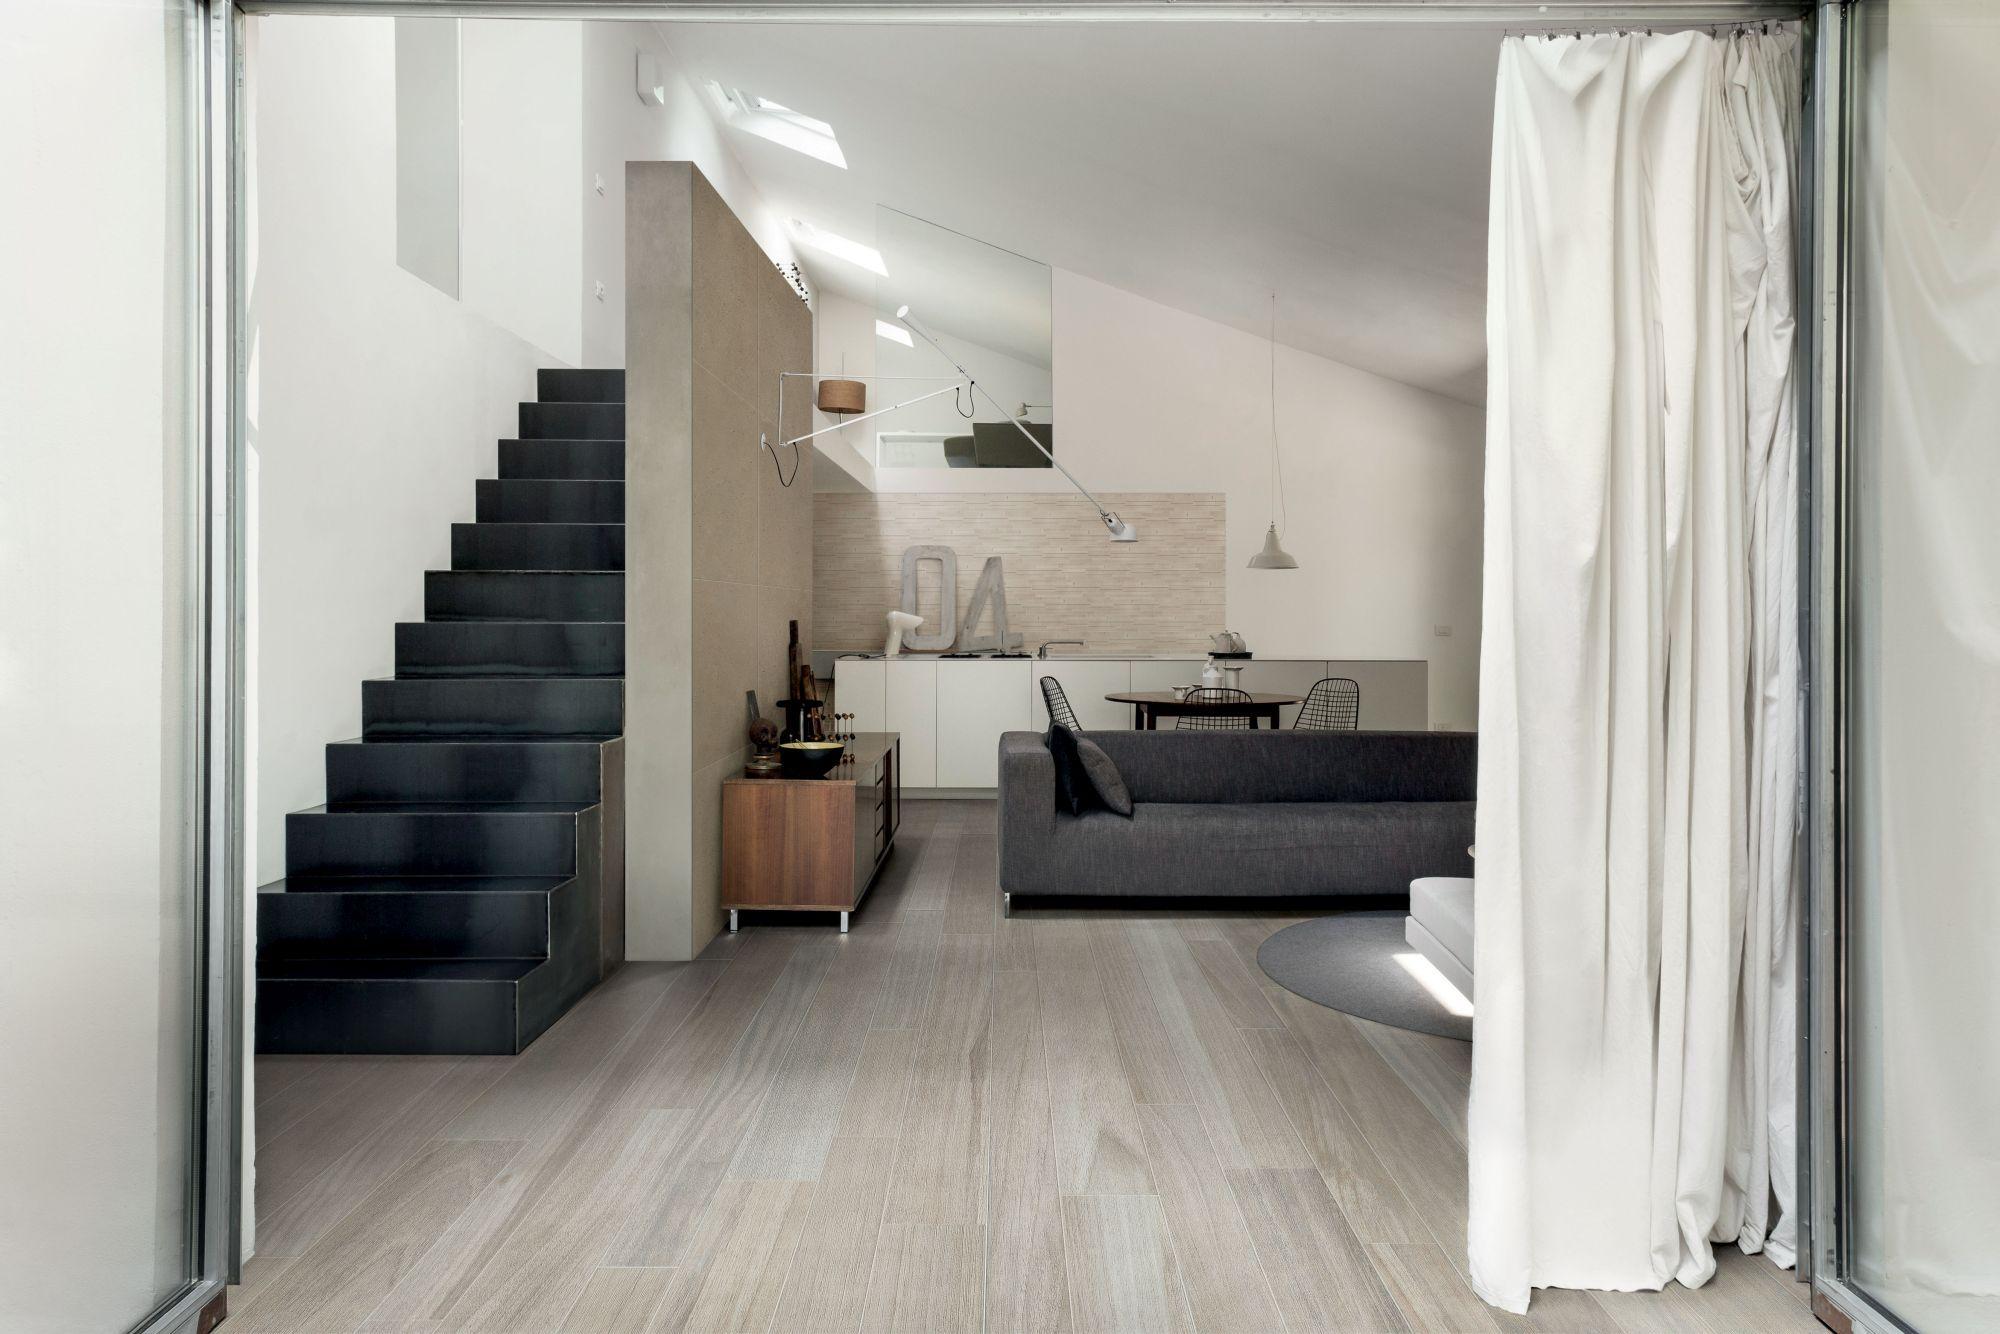 Florim ceramiche casa dolce casa stones more pavimenti carrelage carrelage salon et salon - Casa dolce casa ceramiche ...